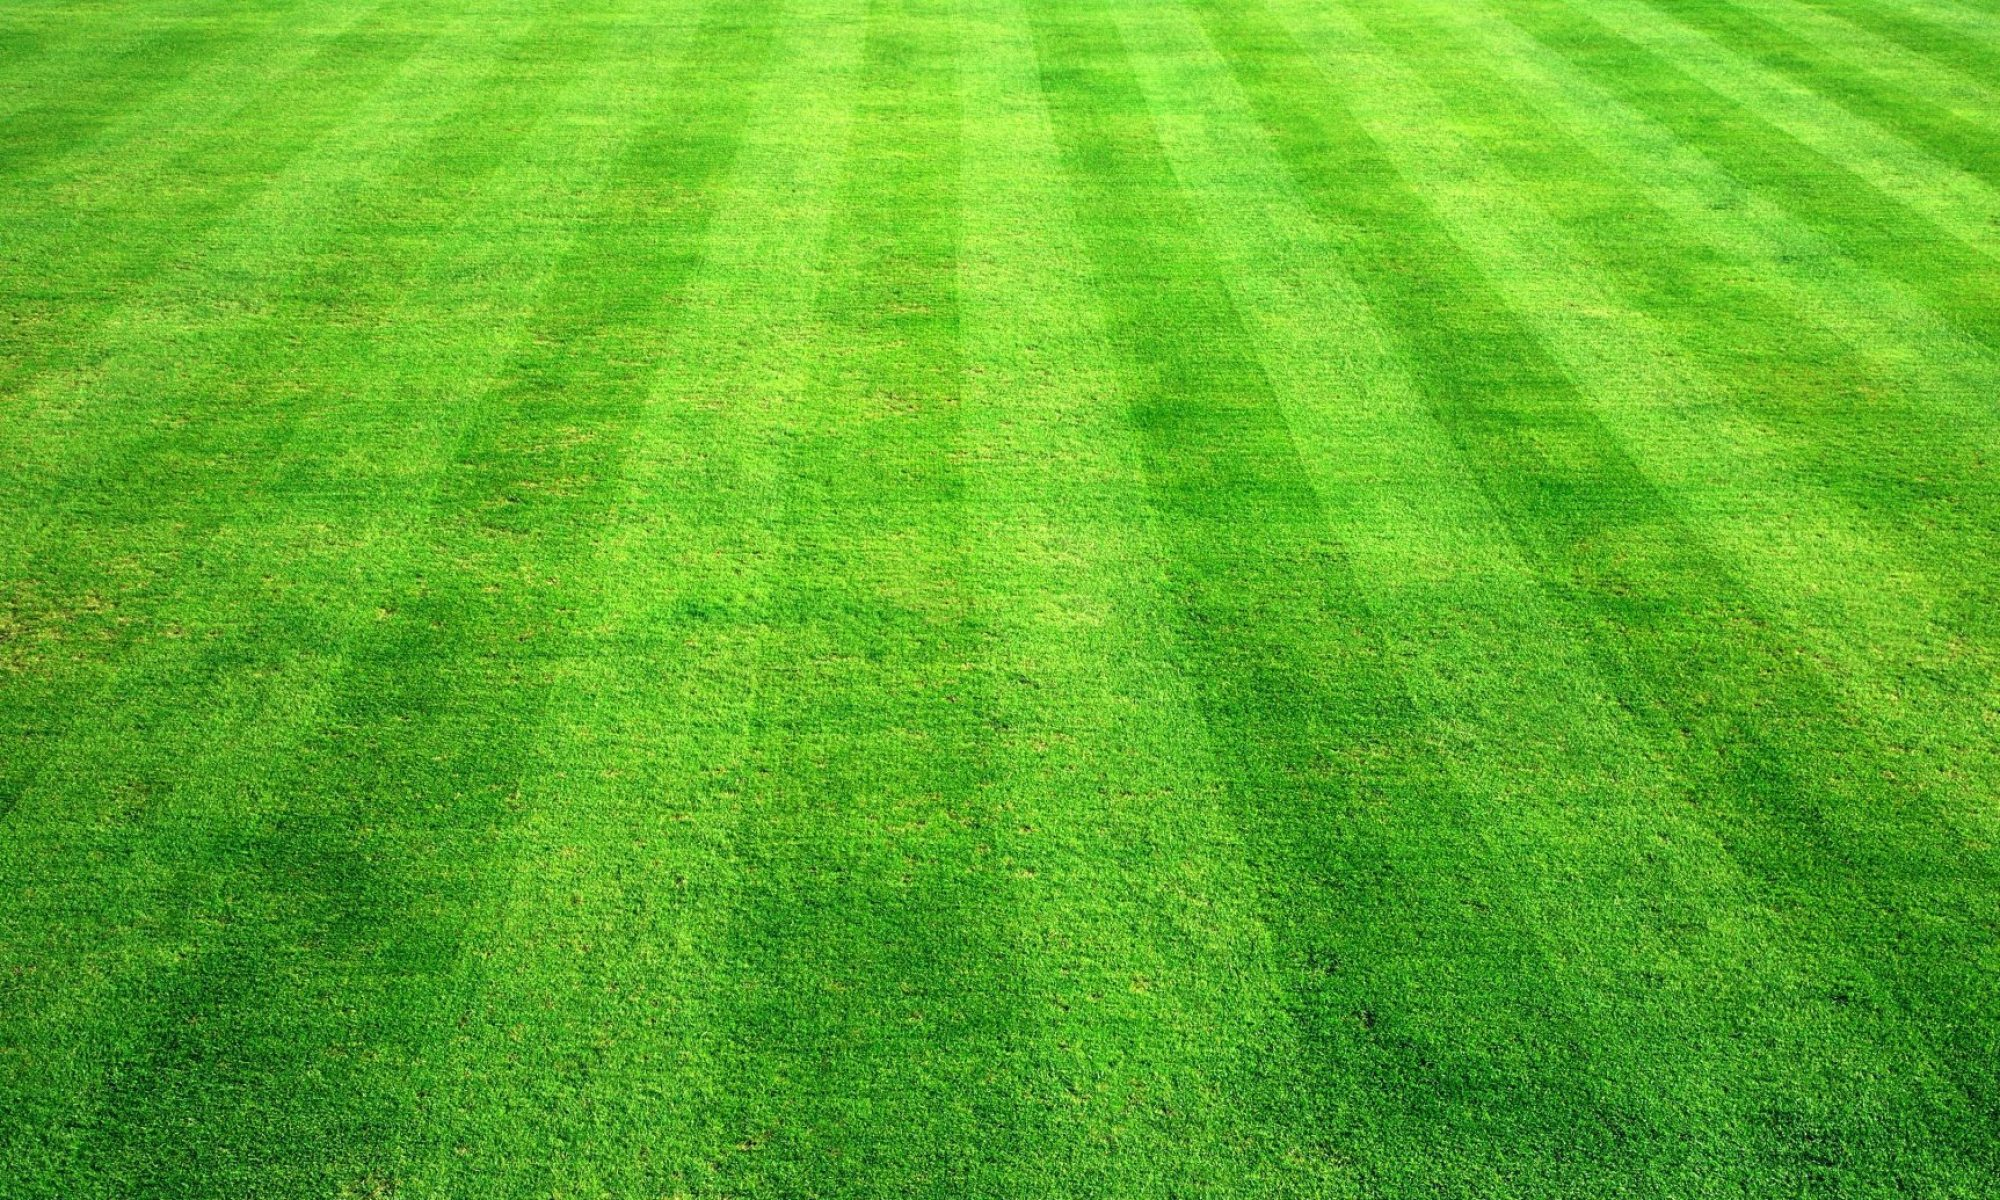 Huddersfield Croquet Club